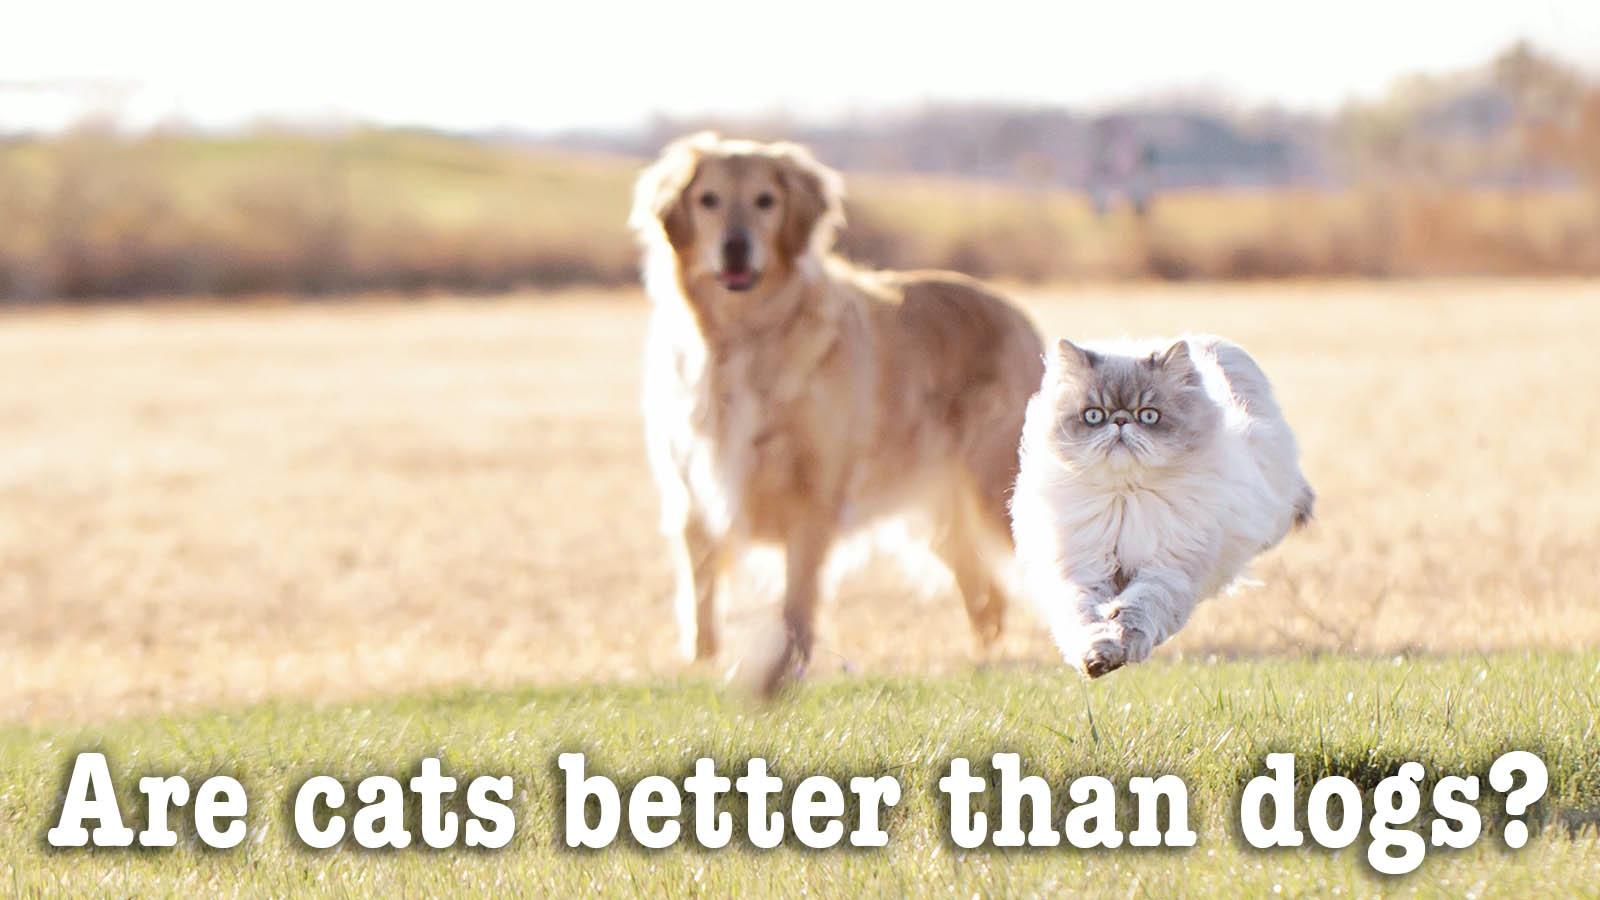 Persuasive essay question cats versus dogs